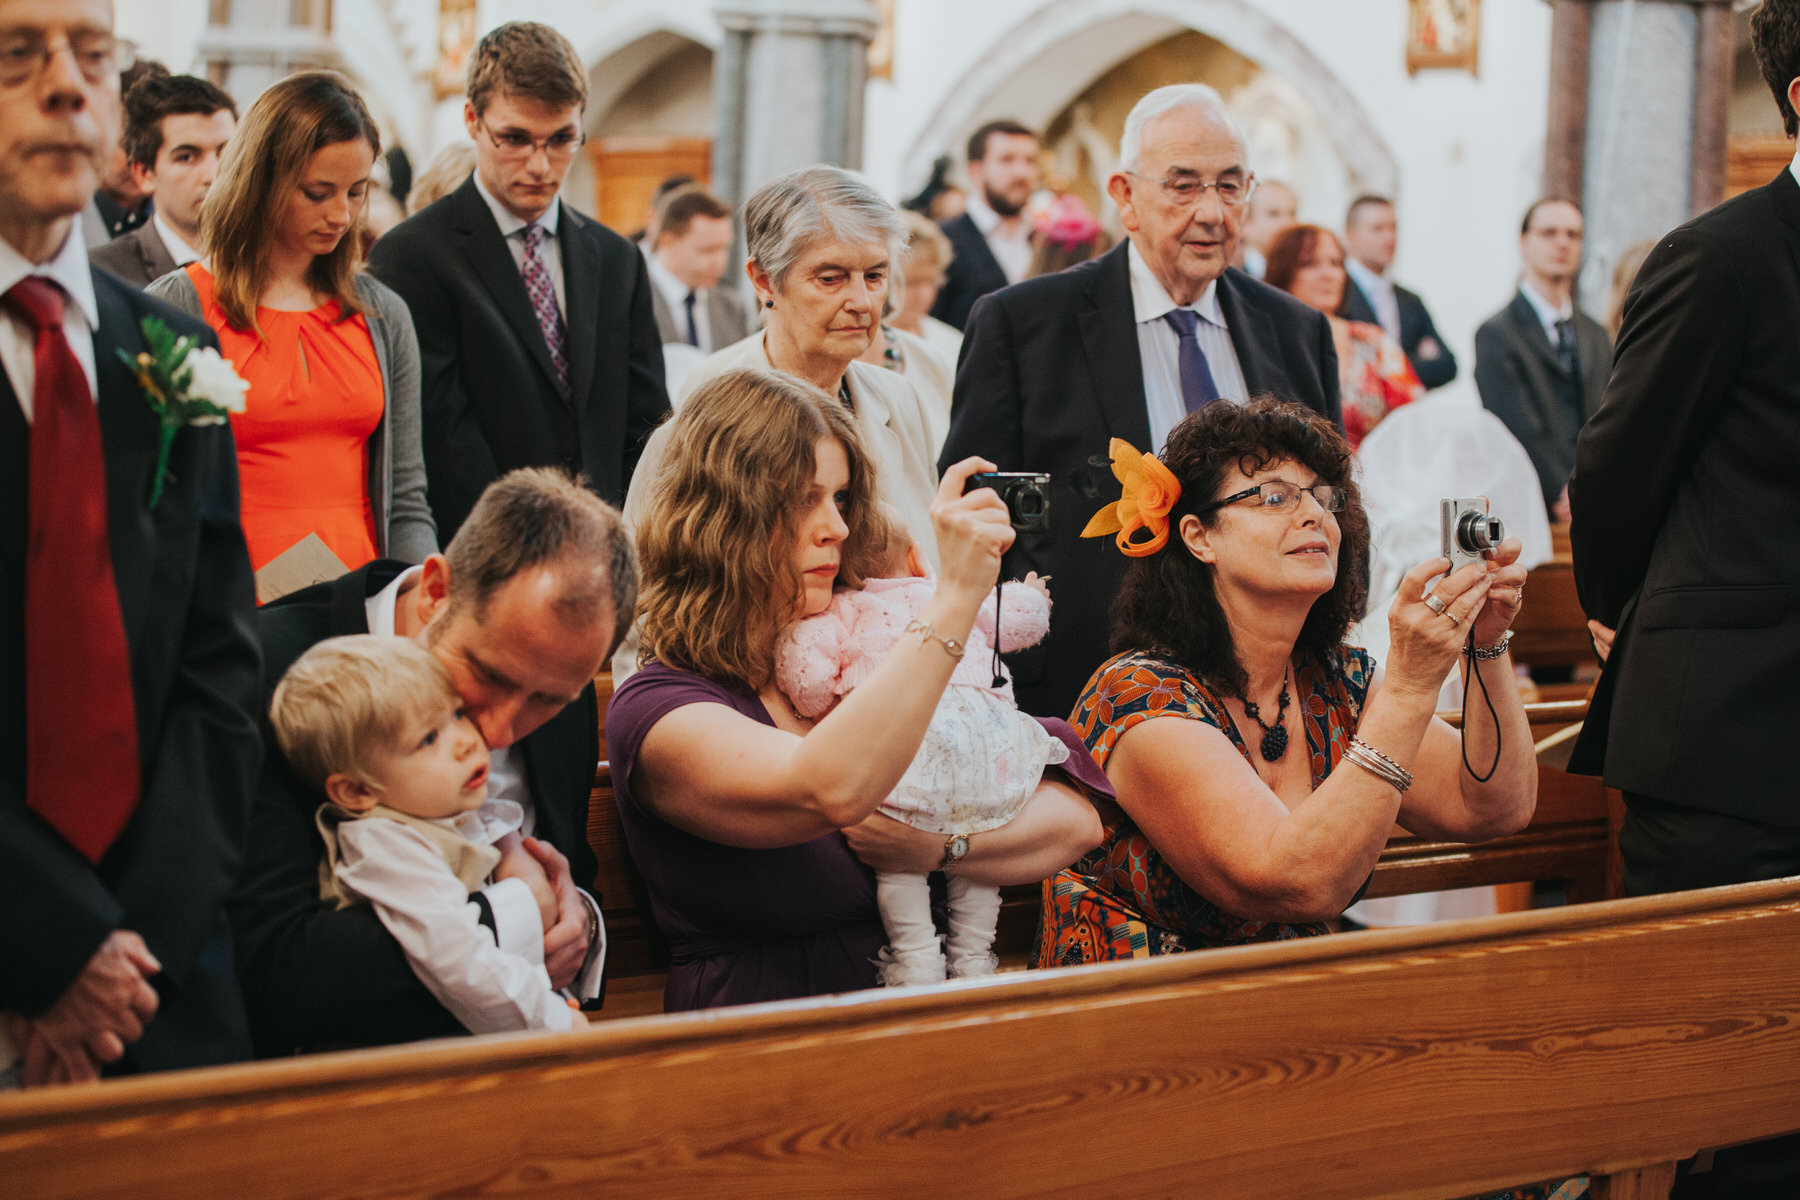 guests taking photos Catholic Church wedding ceremony.jpg